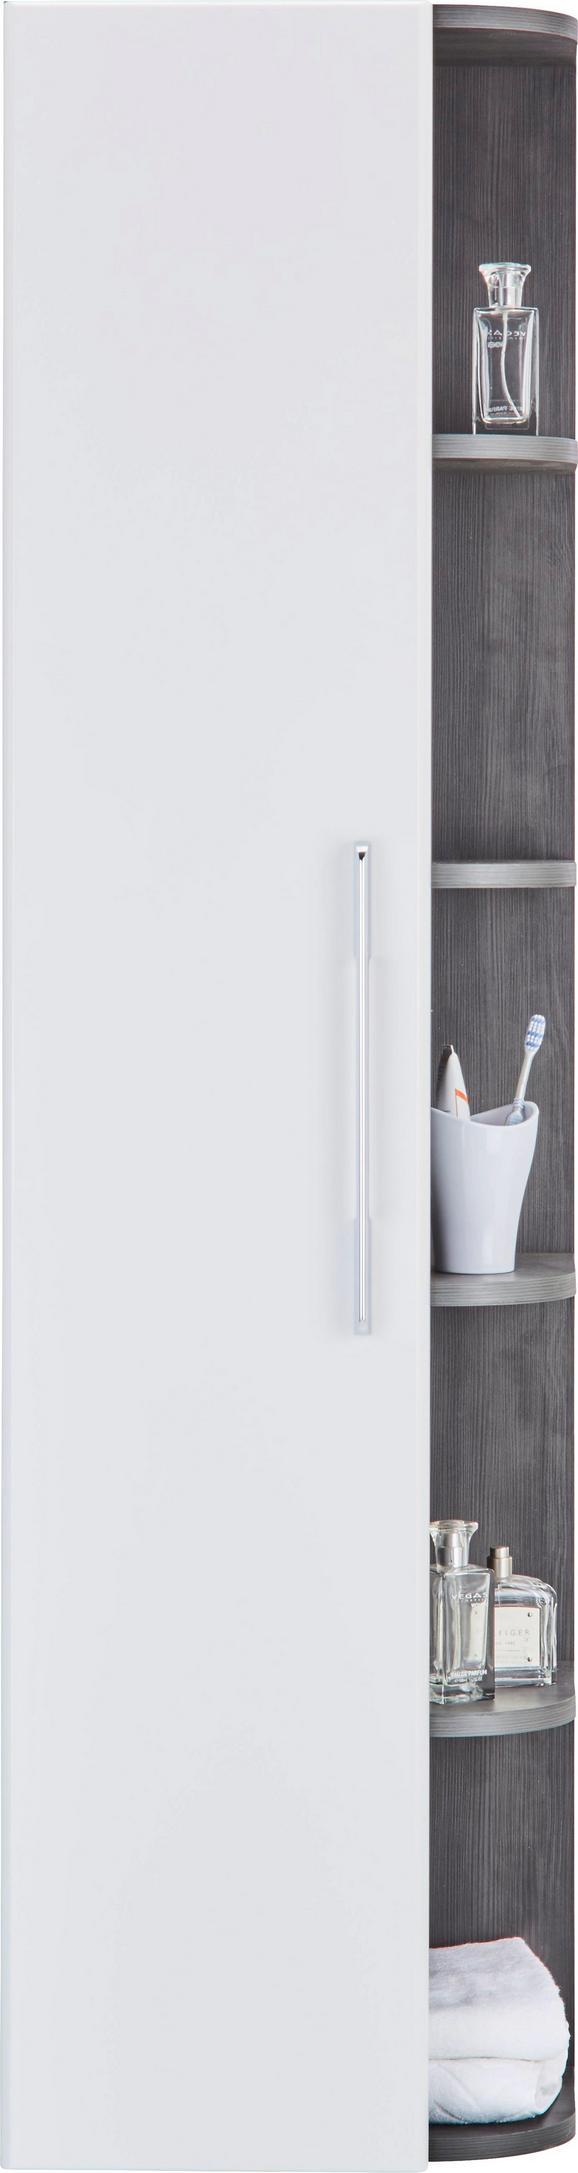 Badezimmerregal Weiß/dunkelgrau - Dunkelgrau/Weiß, MODERN, Holzwerkstoff (40/150/28,5cm) - Mömax modern living